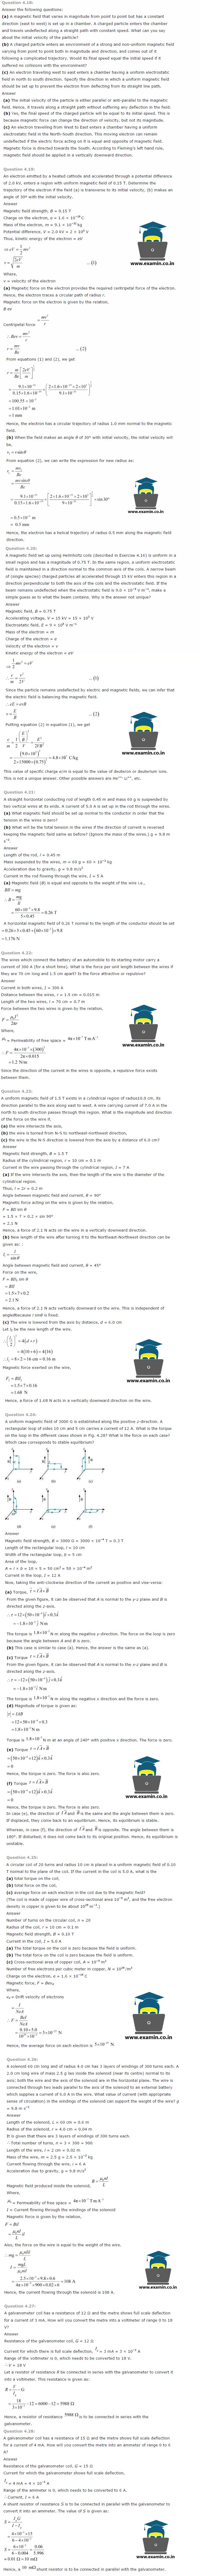 NCERT Solutions Class 12 Physics Chapter 4